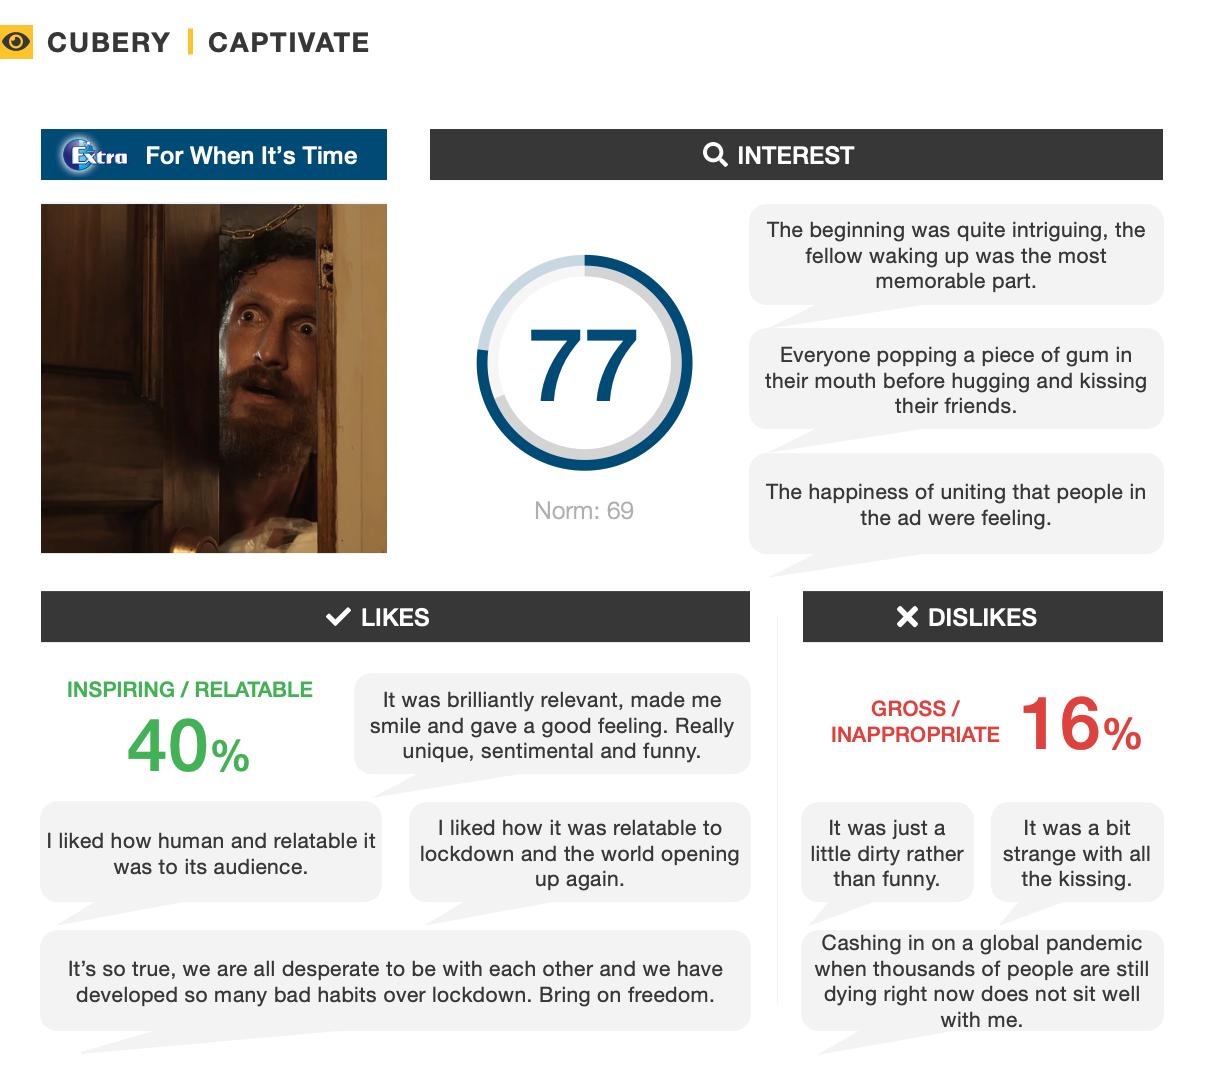 Wrigley's Extra - Ad Testing Covid - Captivate